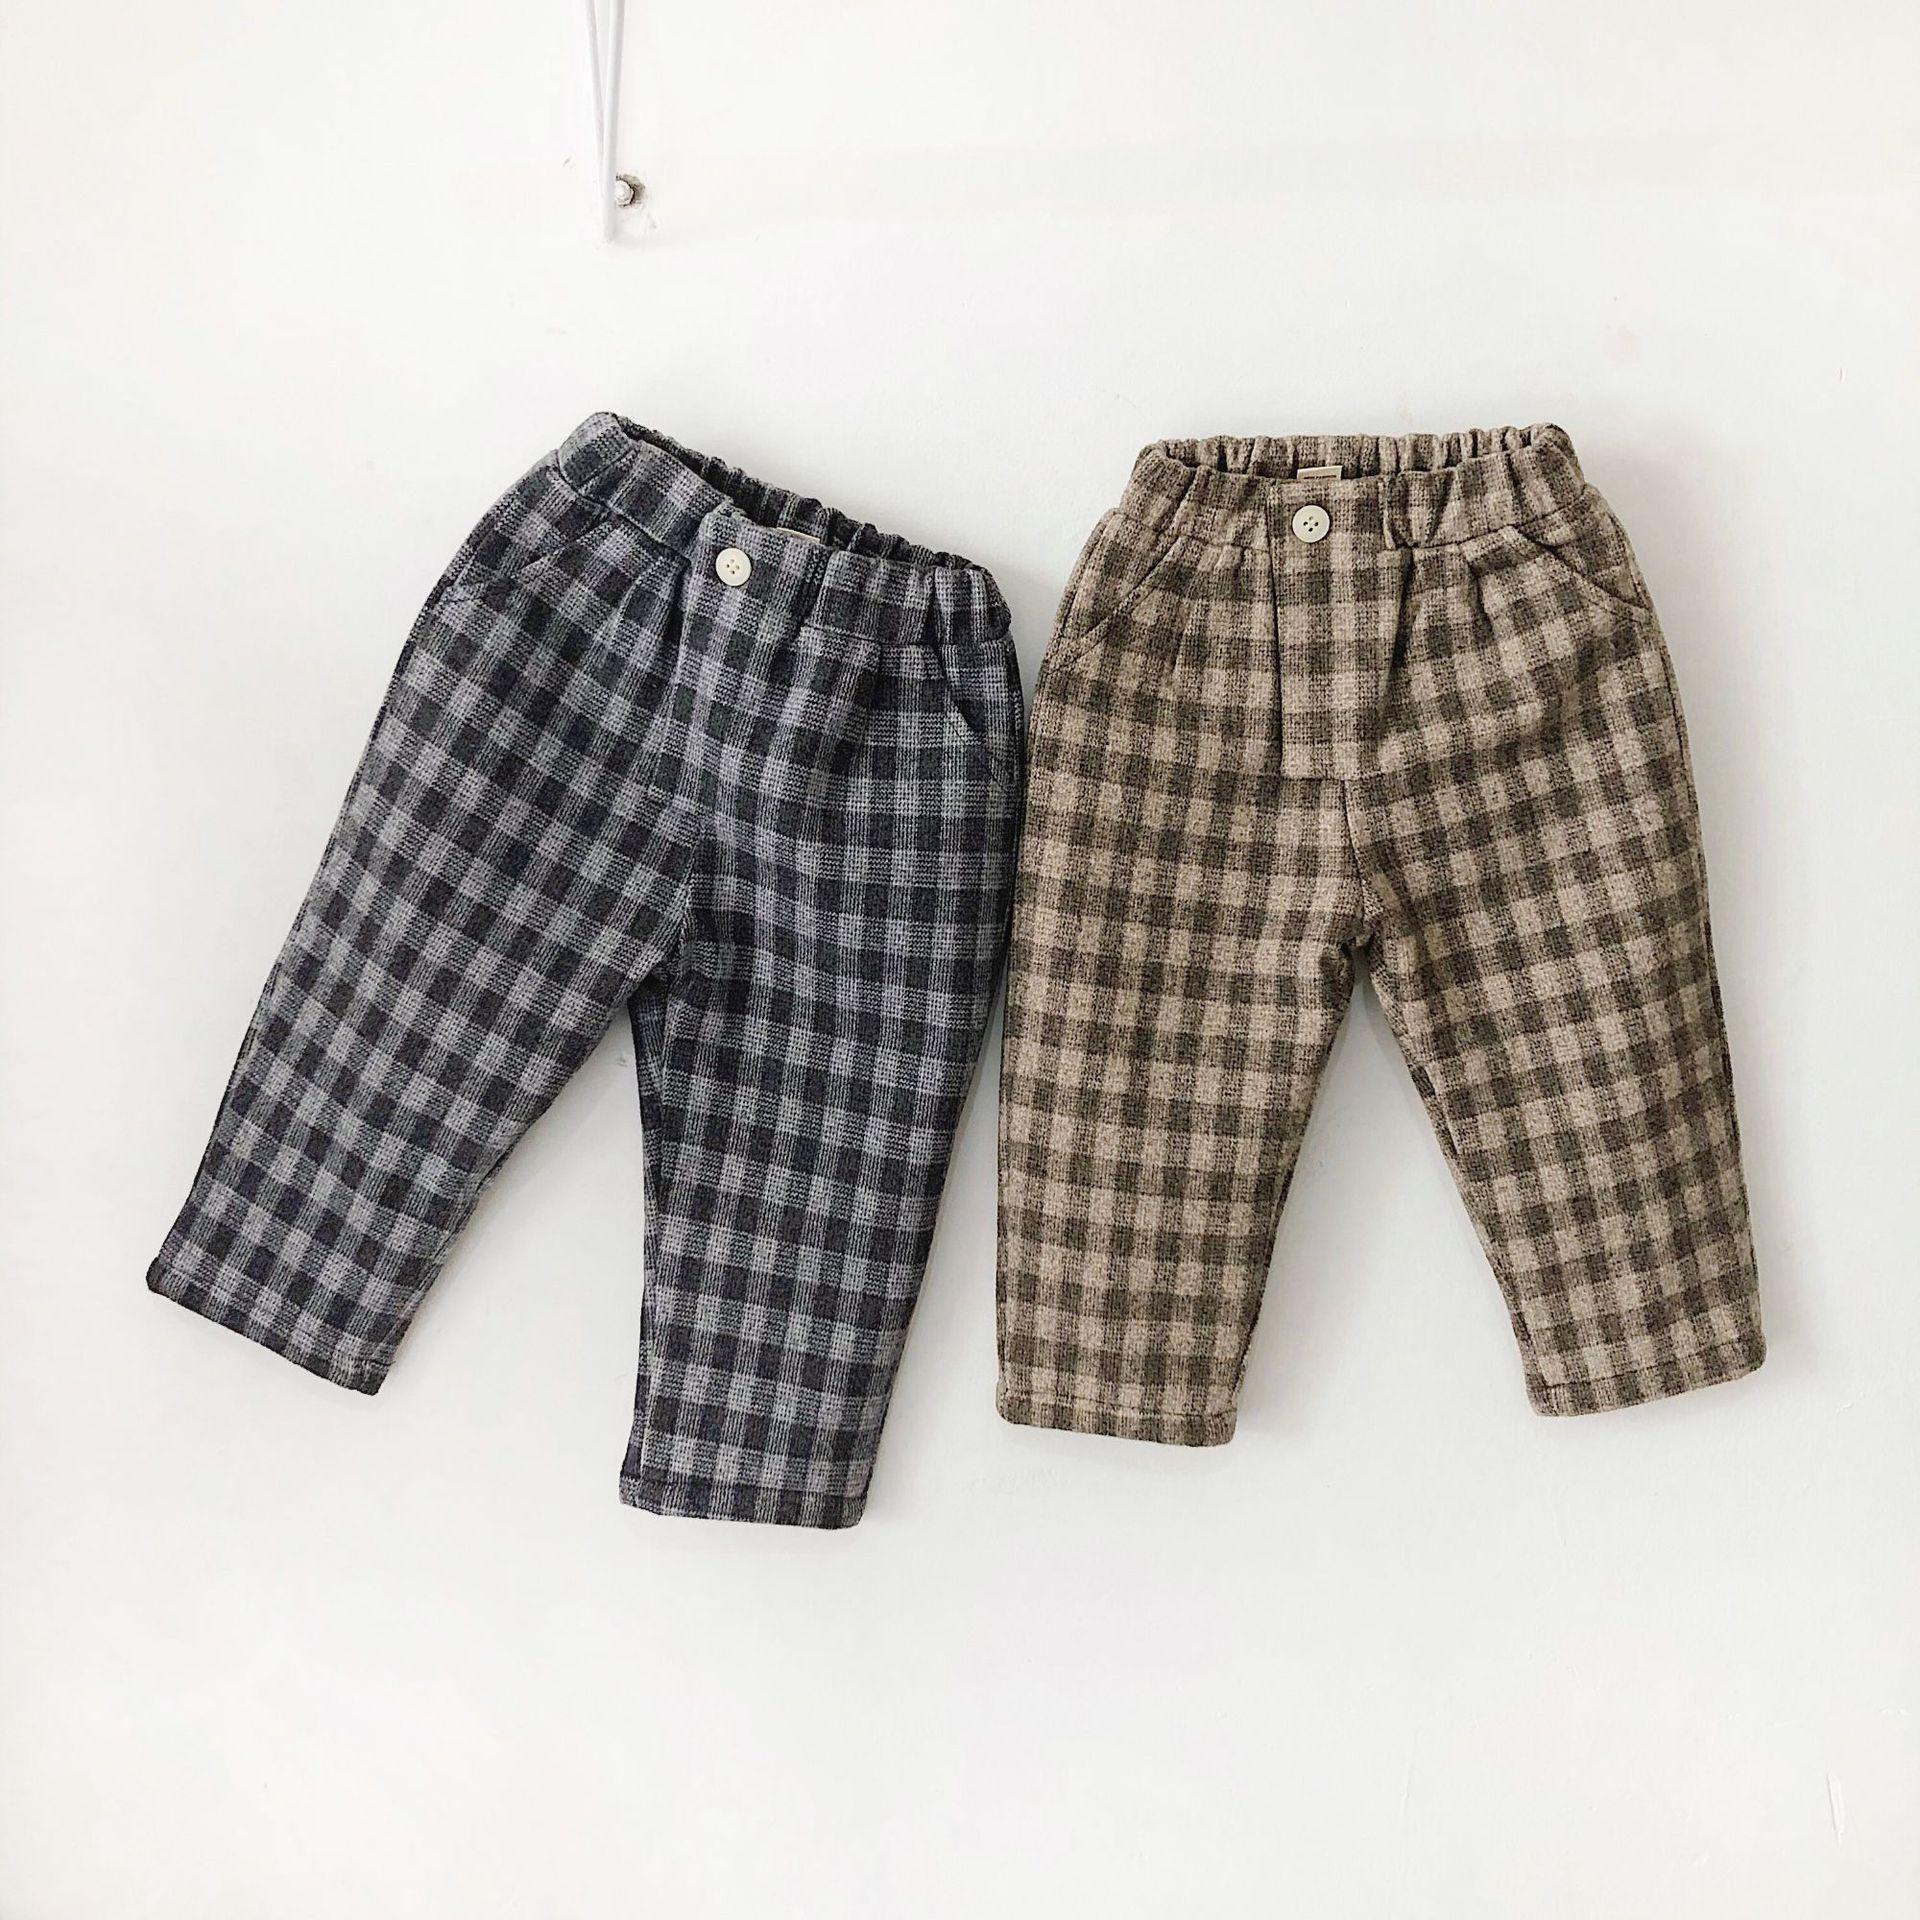 Unisex plaid pants